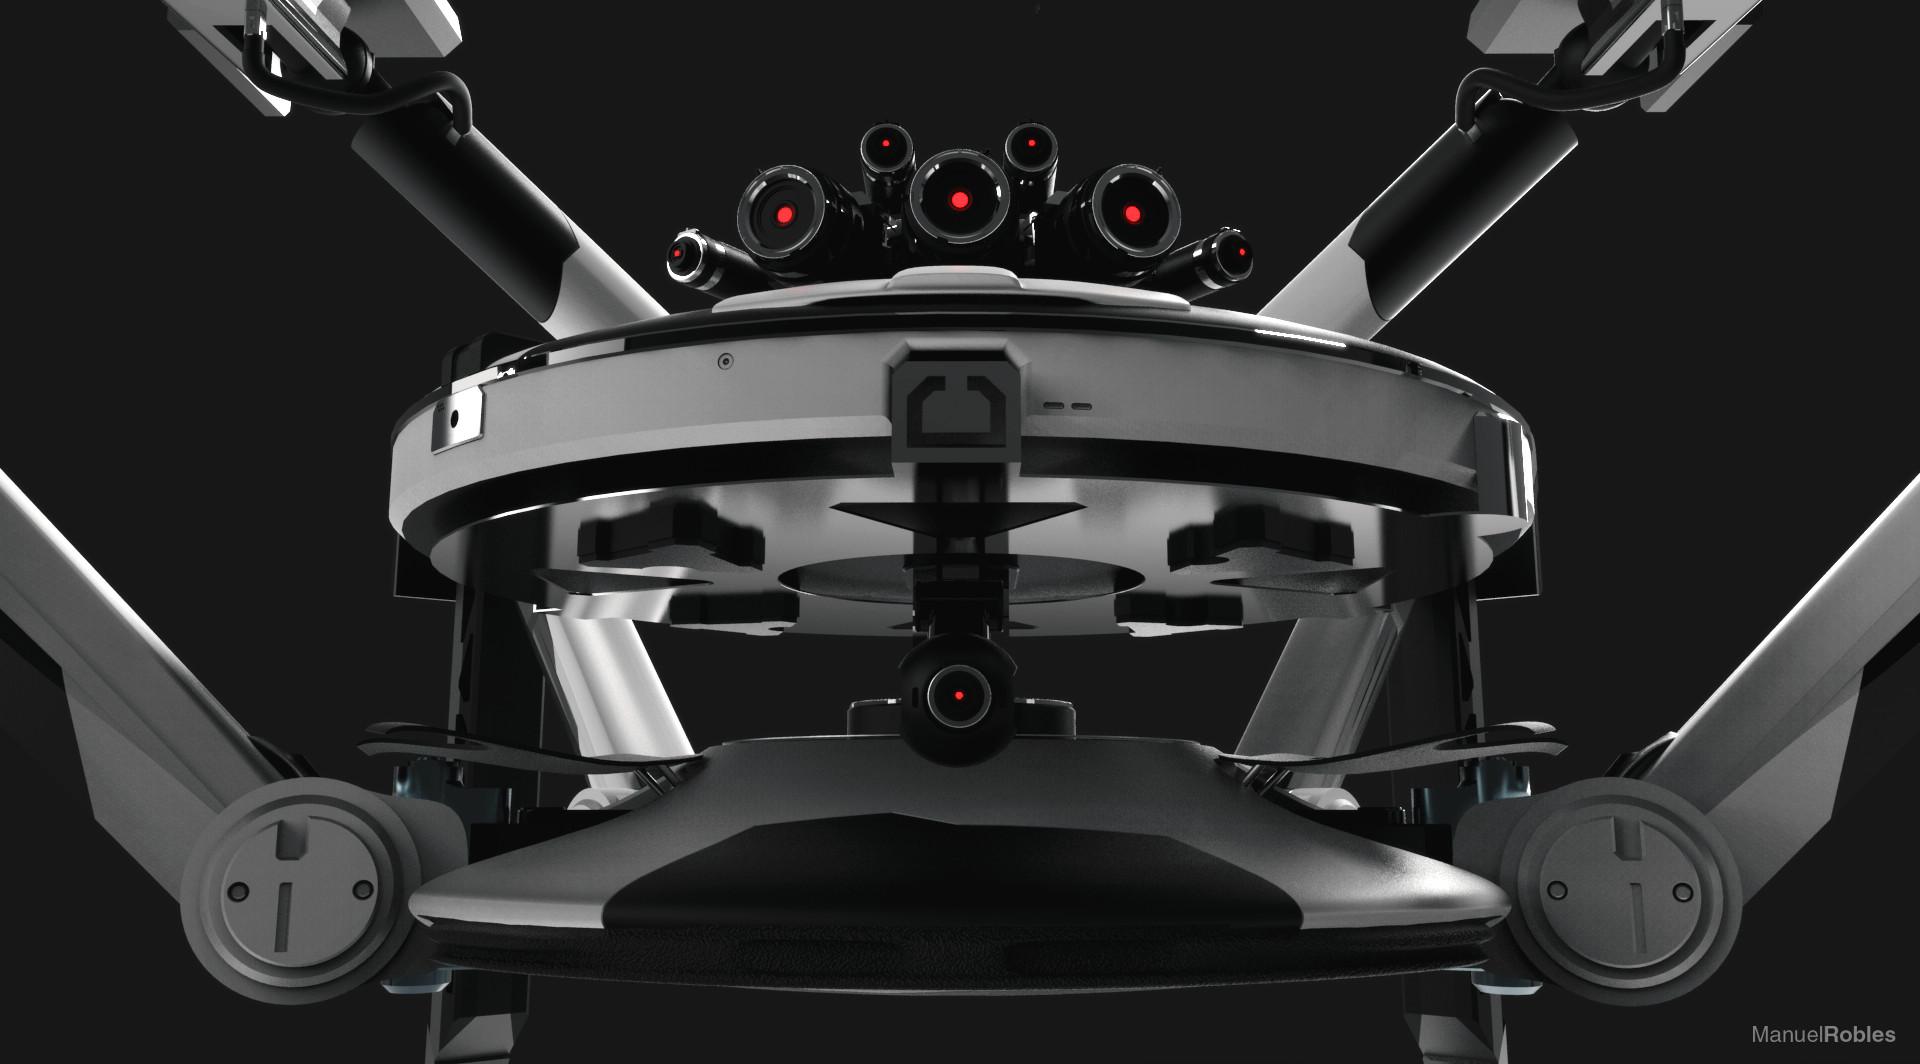 Manuel robles spider robotdron 02 viewset 24